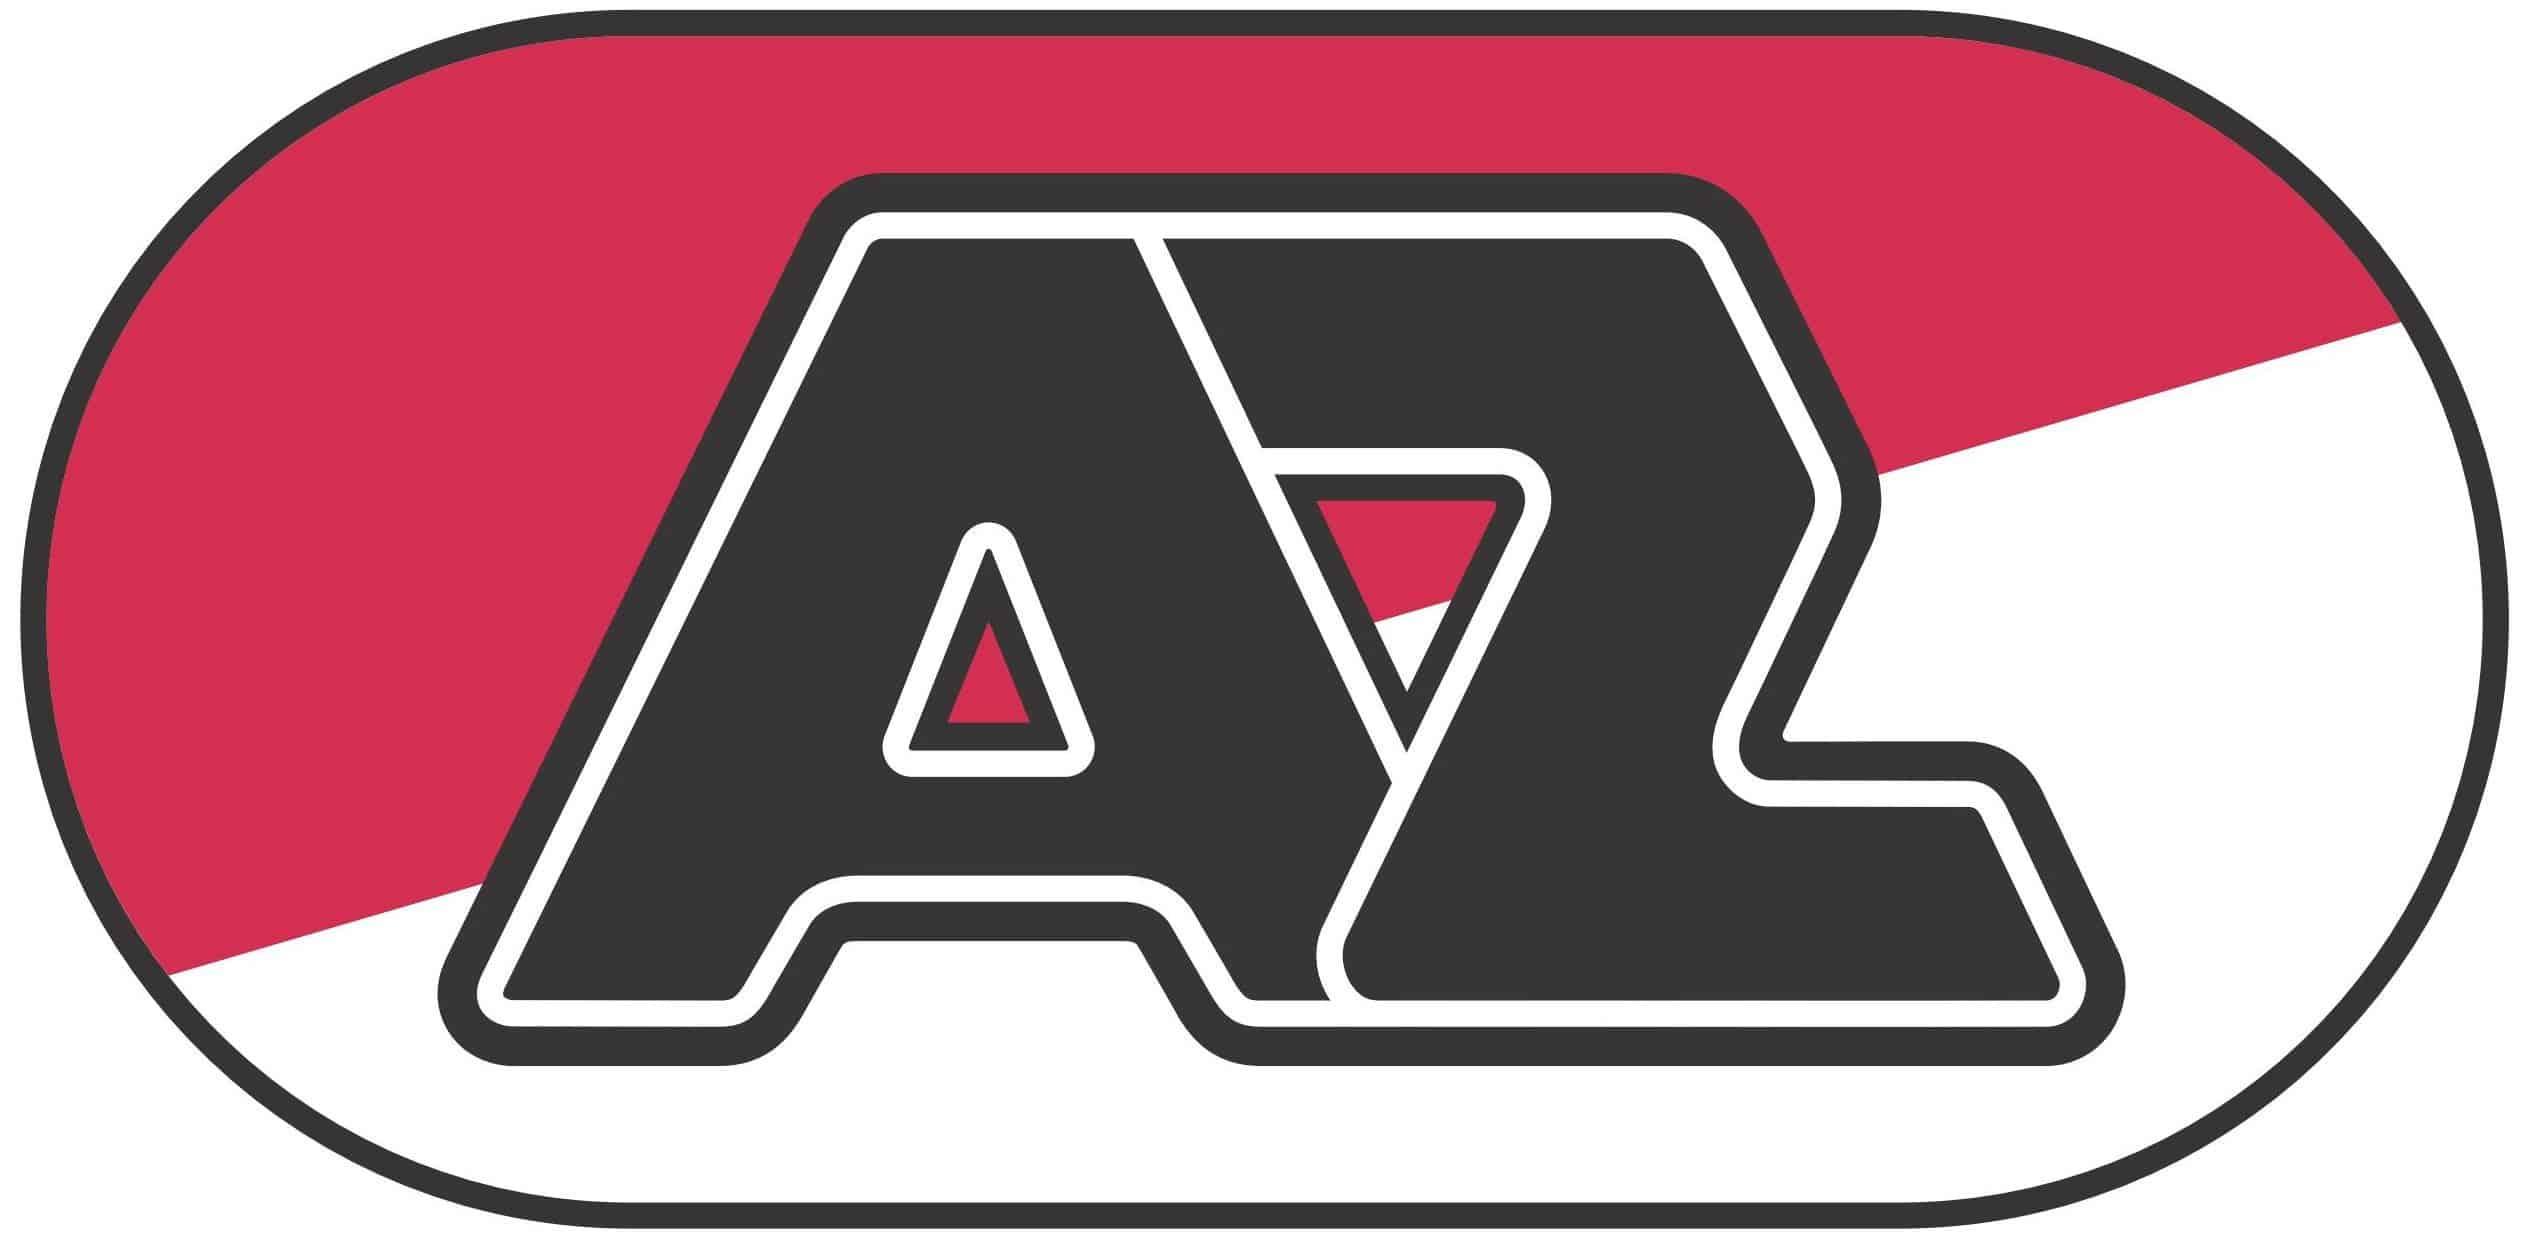 AZ Logo [Alkmaar Zaanstreek – EPS File] Vector EPS Free Download, Logo, Icons, Brand Emblems